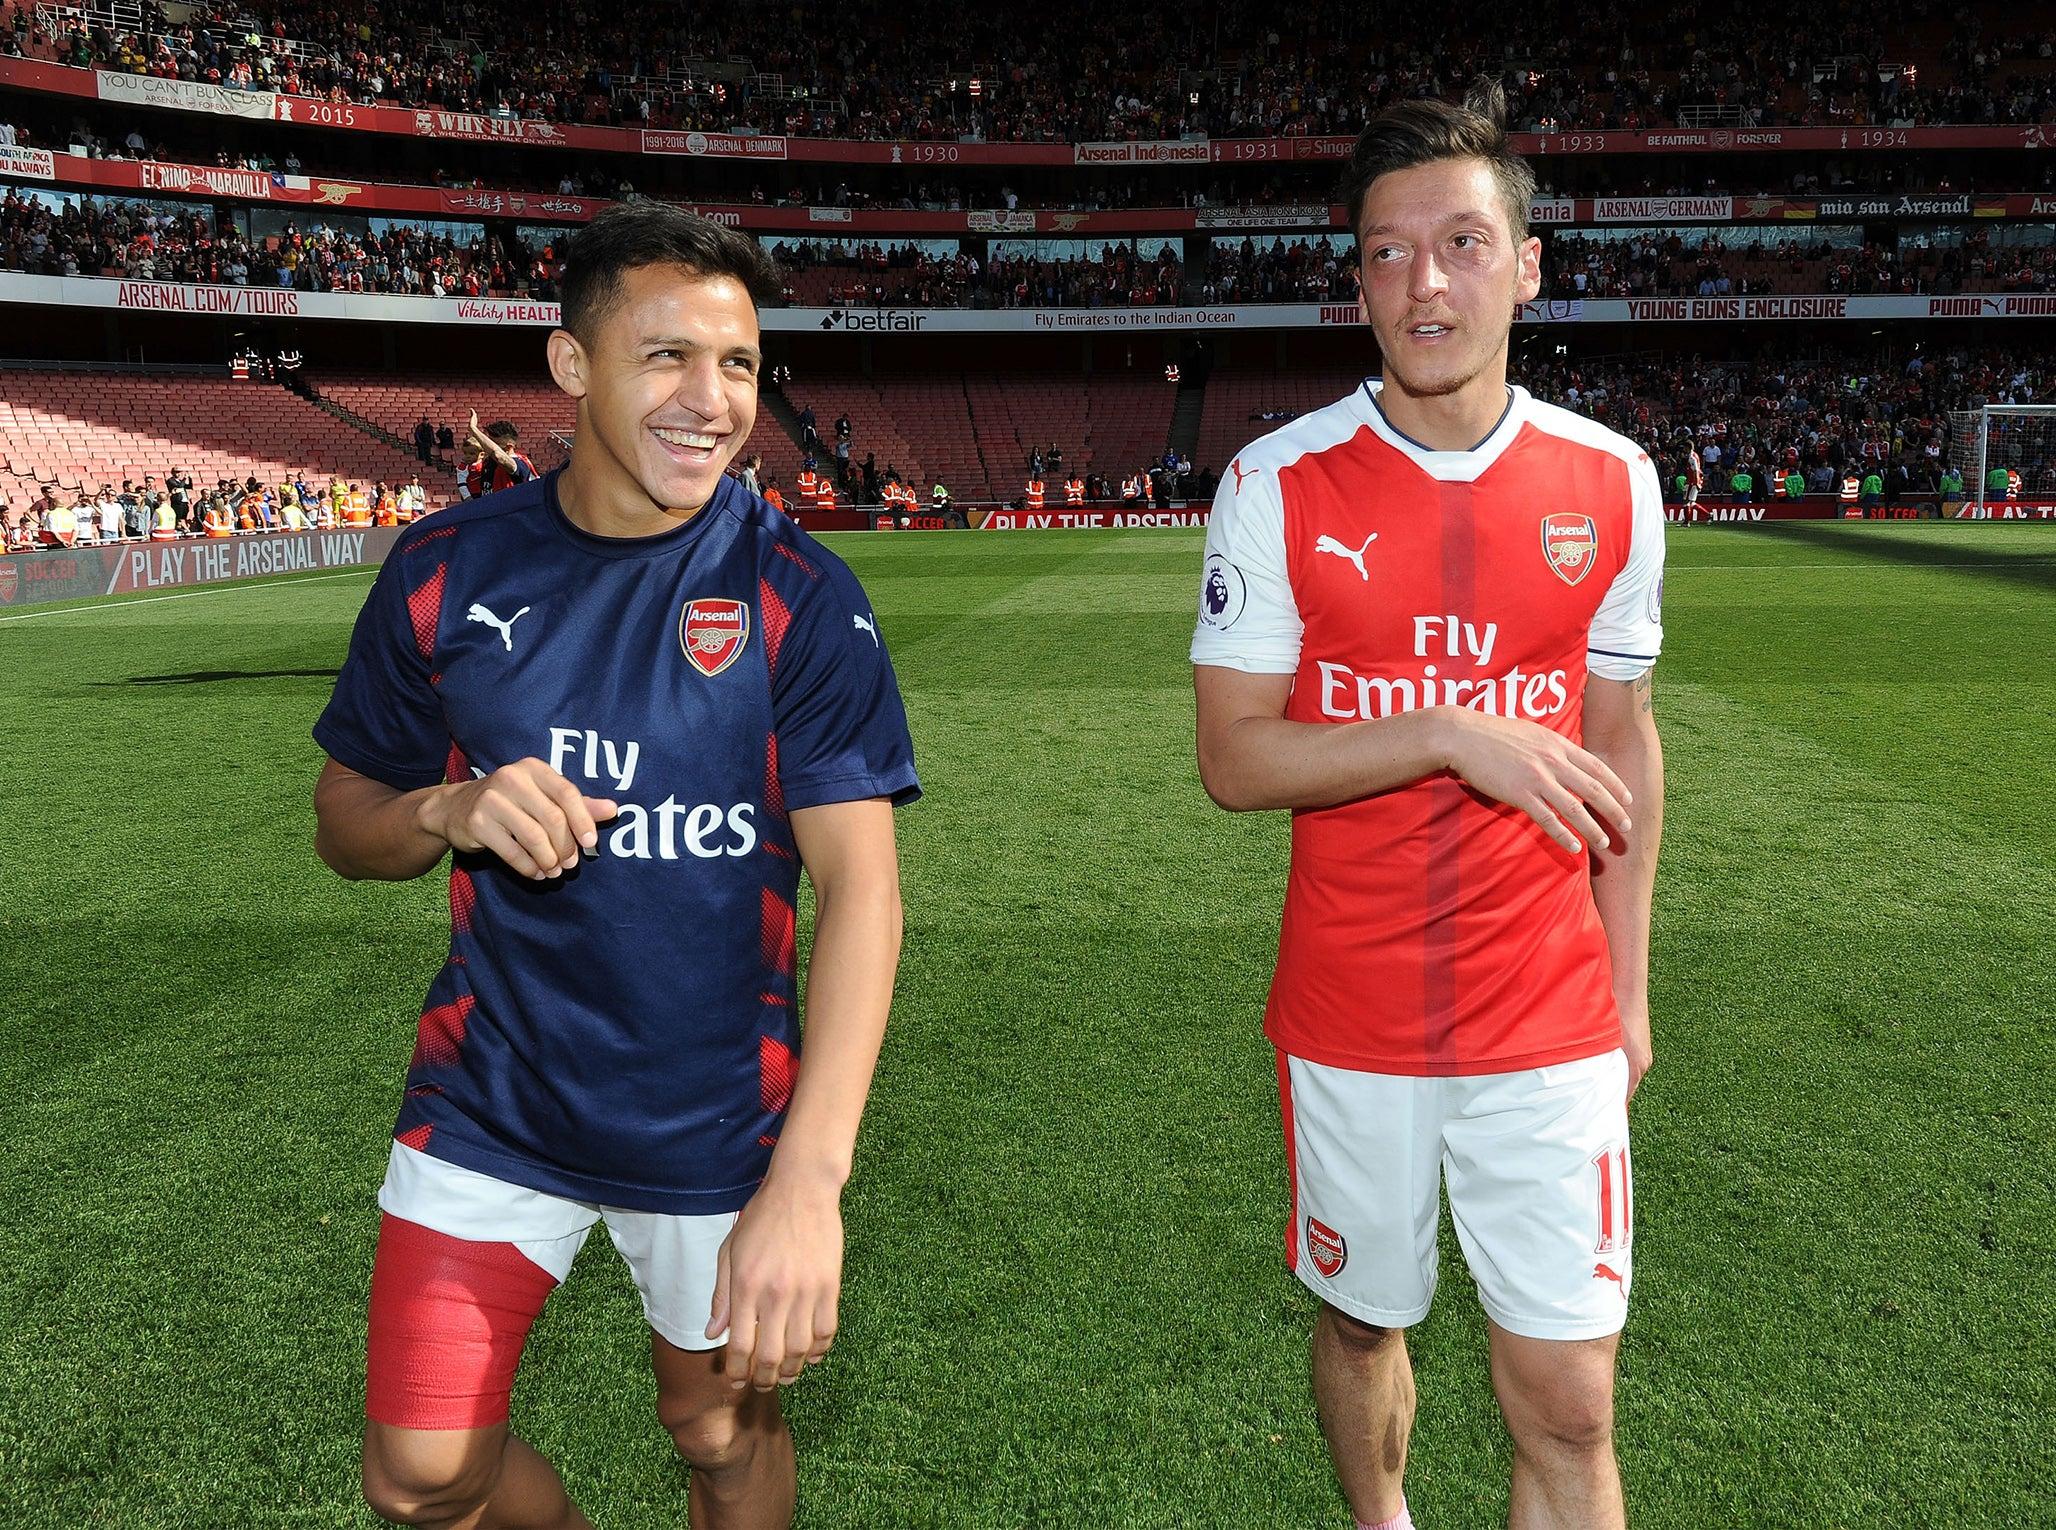 Alexis Sanchez and Mesut Ozil won't leave Arsenal this January transfer window, insists Nacho Monreal